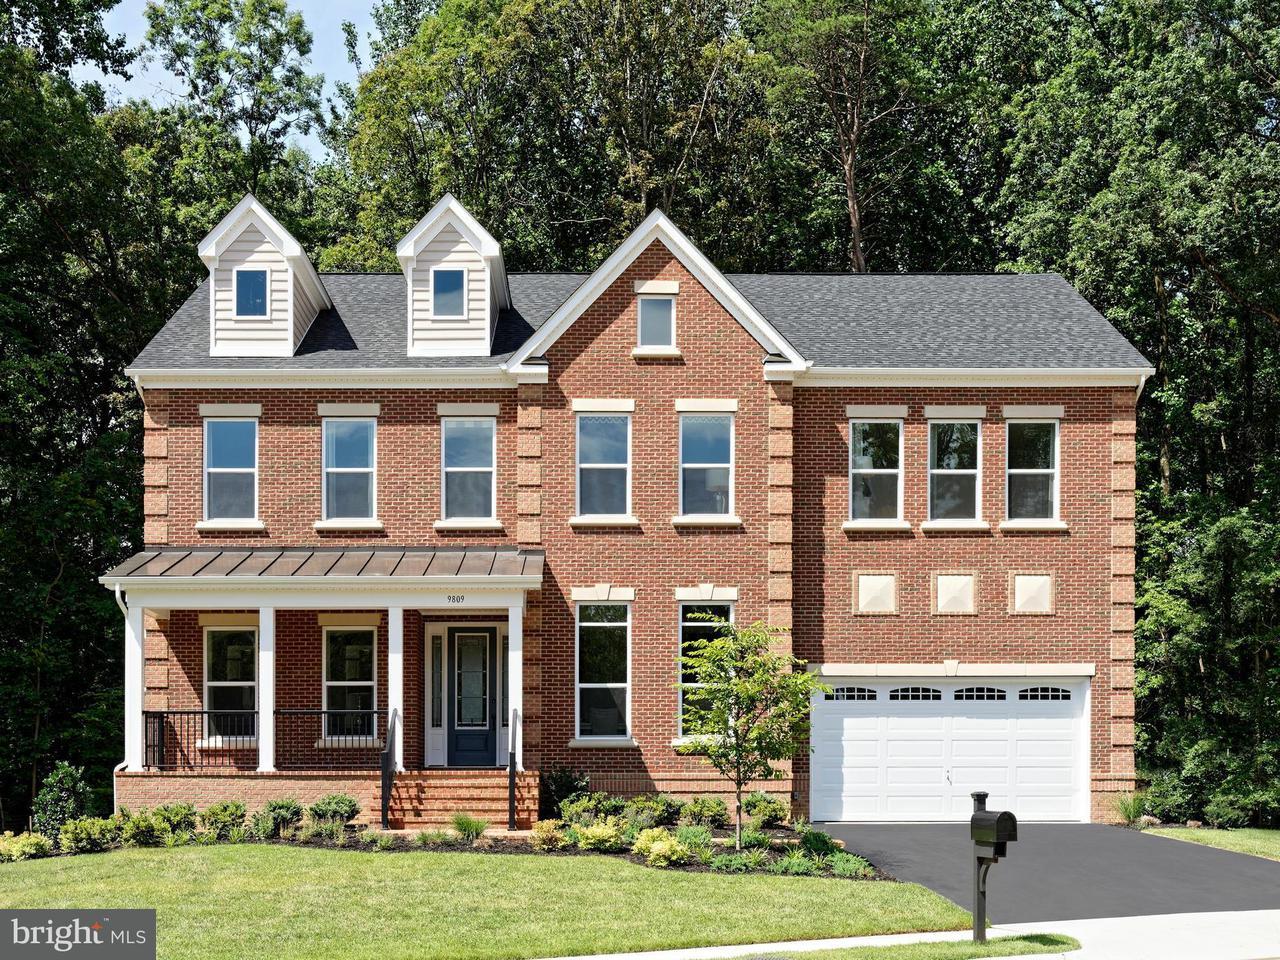 Casa Unifamiliar por un Venta en 9811 SHEADS Court 9811 SHEADS Court Burke, Virginia 22015 Estados Unidos